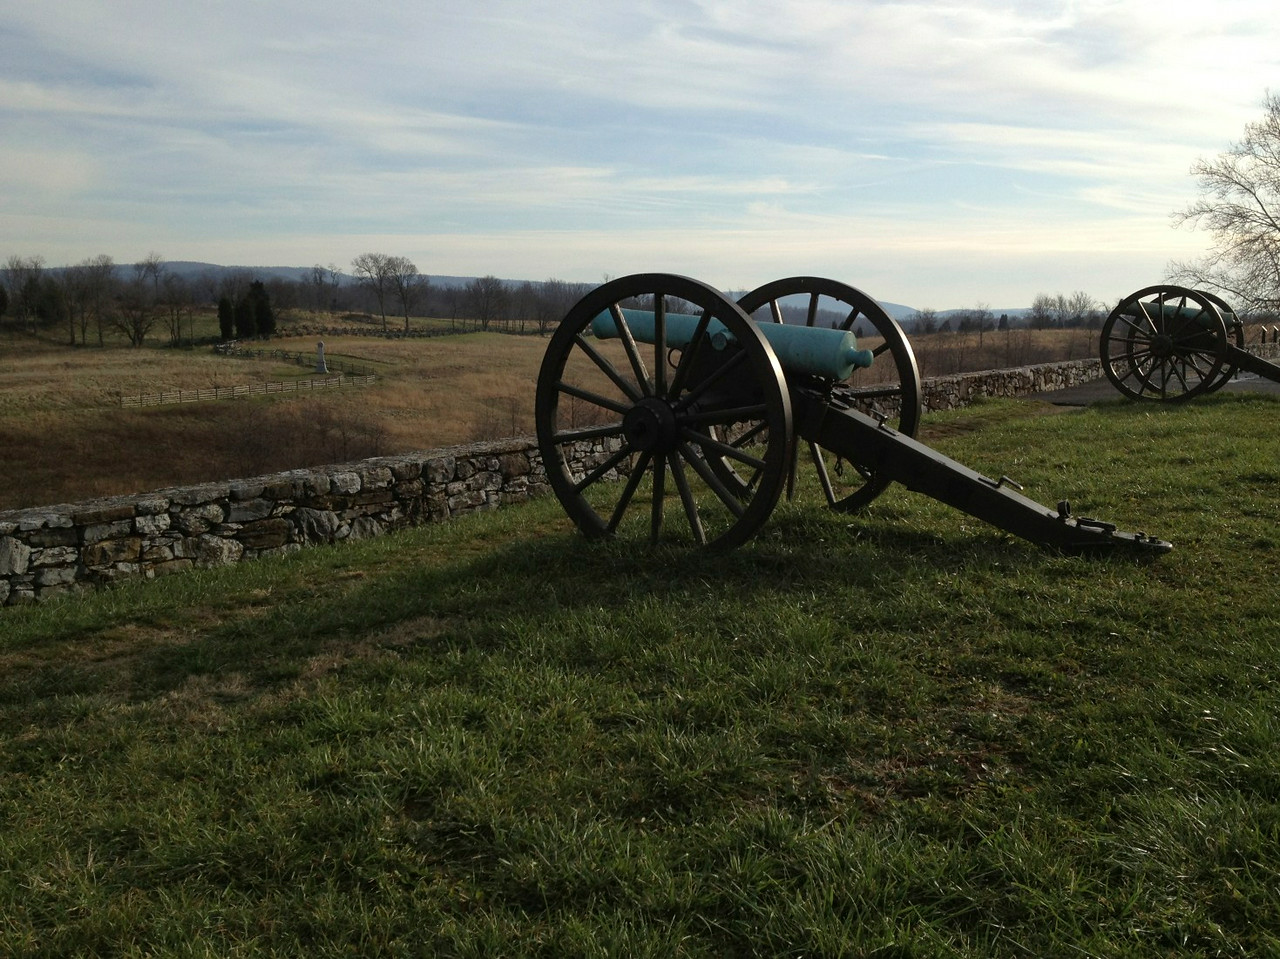 Cannon overlooking Antietam Battlefield